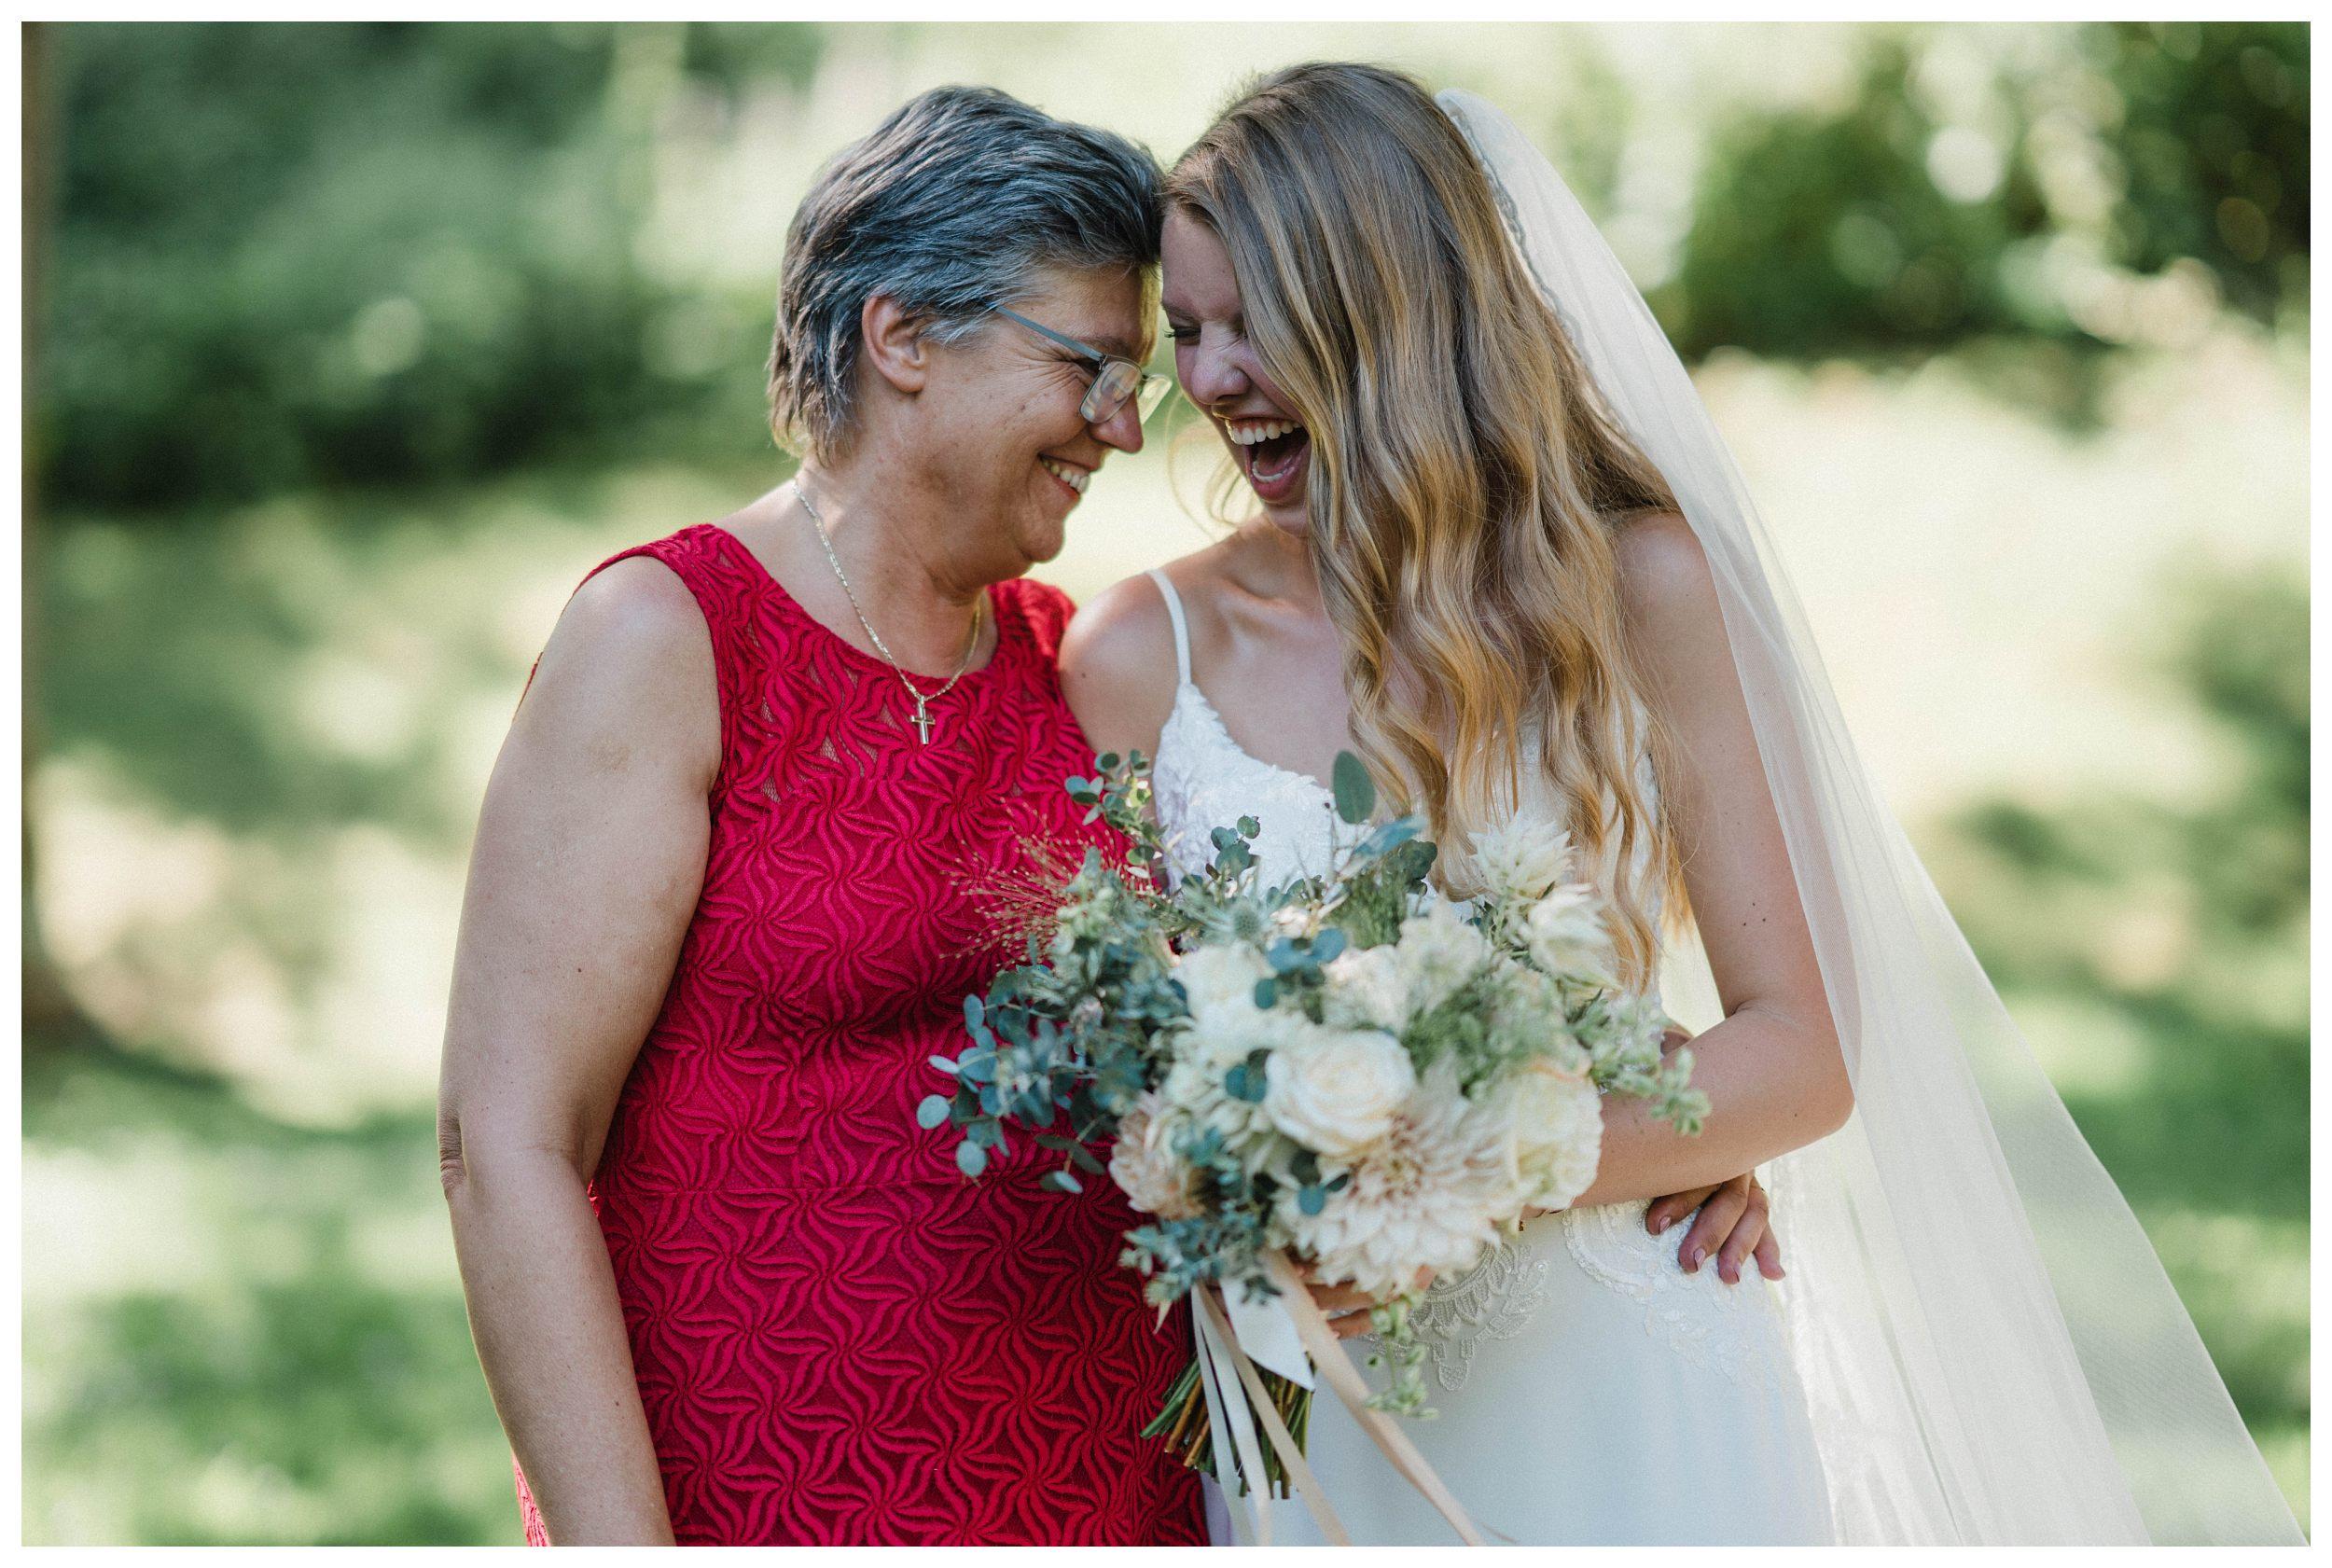 huwelijksfotograaf bruidsfotograaf destinationwedding huwelijksfotografie in ardennen nederland (74).jpg